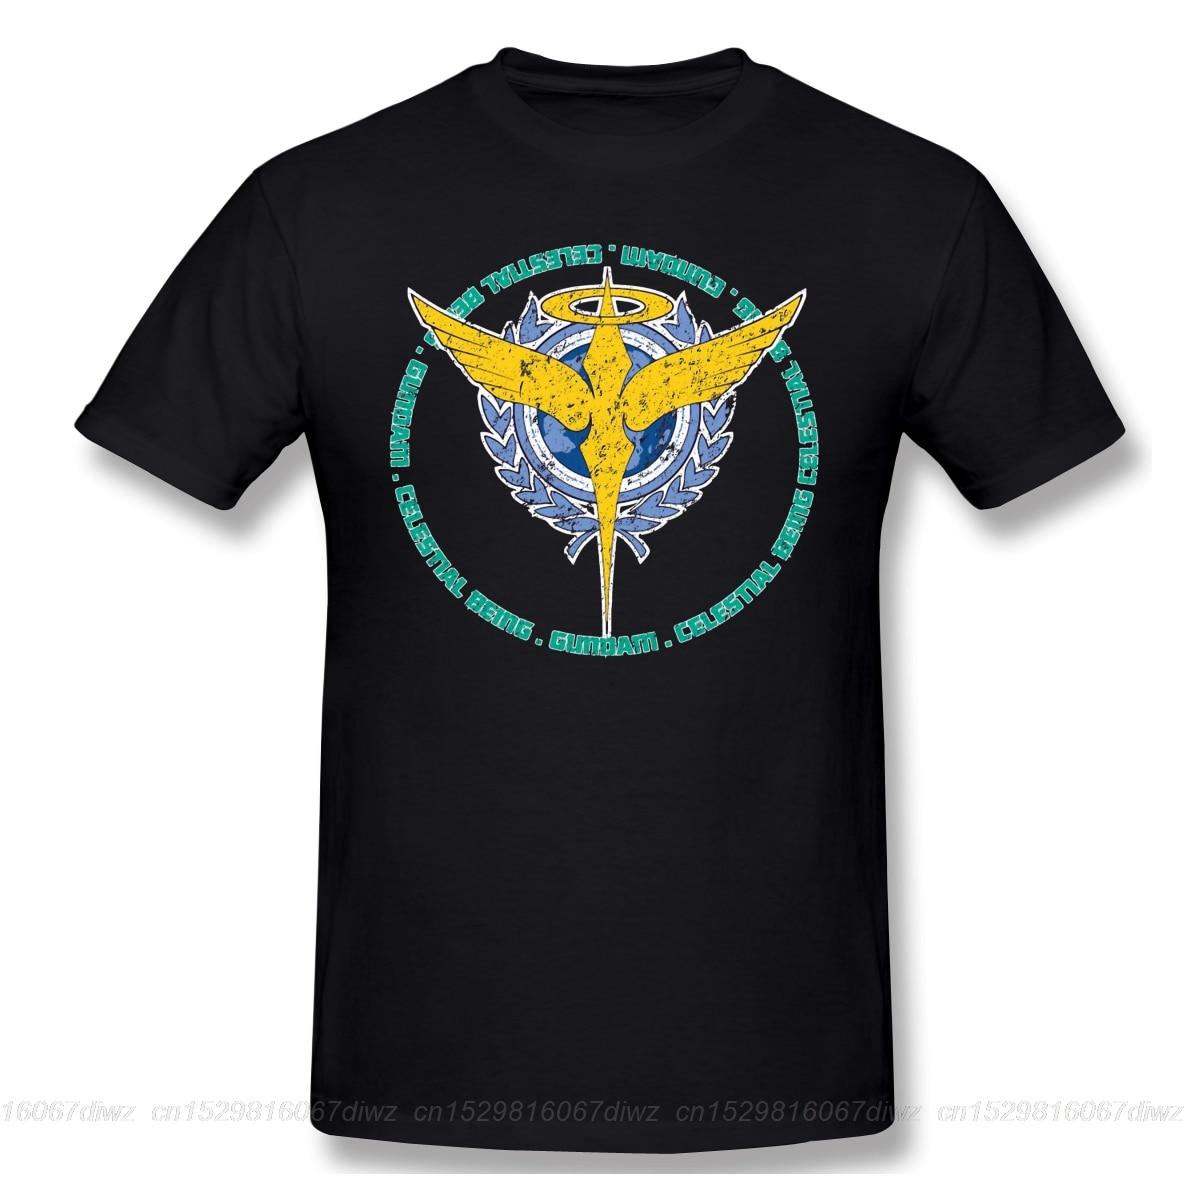 Camisetas divertidas de algodón con estampado de verano Celestial Being, camiseta de manga corta, traje móvil GUNDAM, ropa de calle de moda para hombre